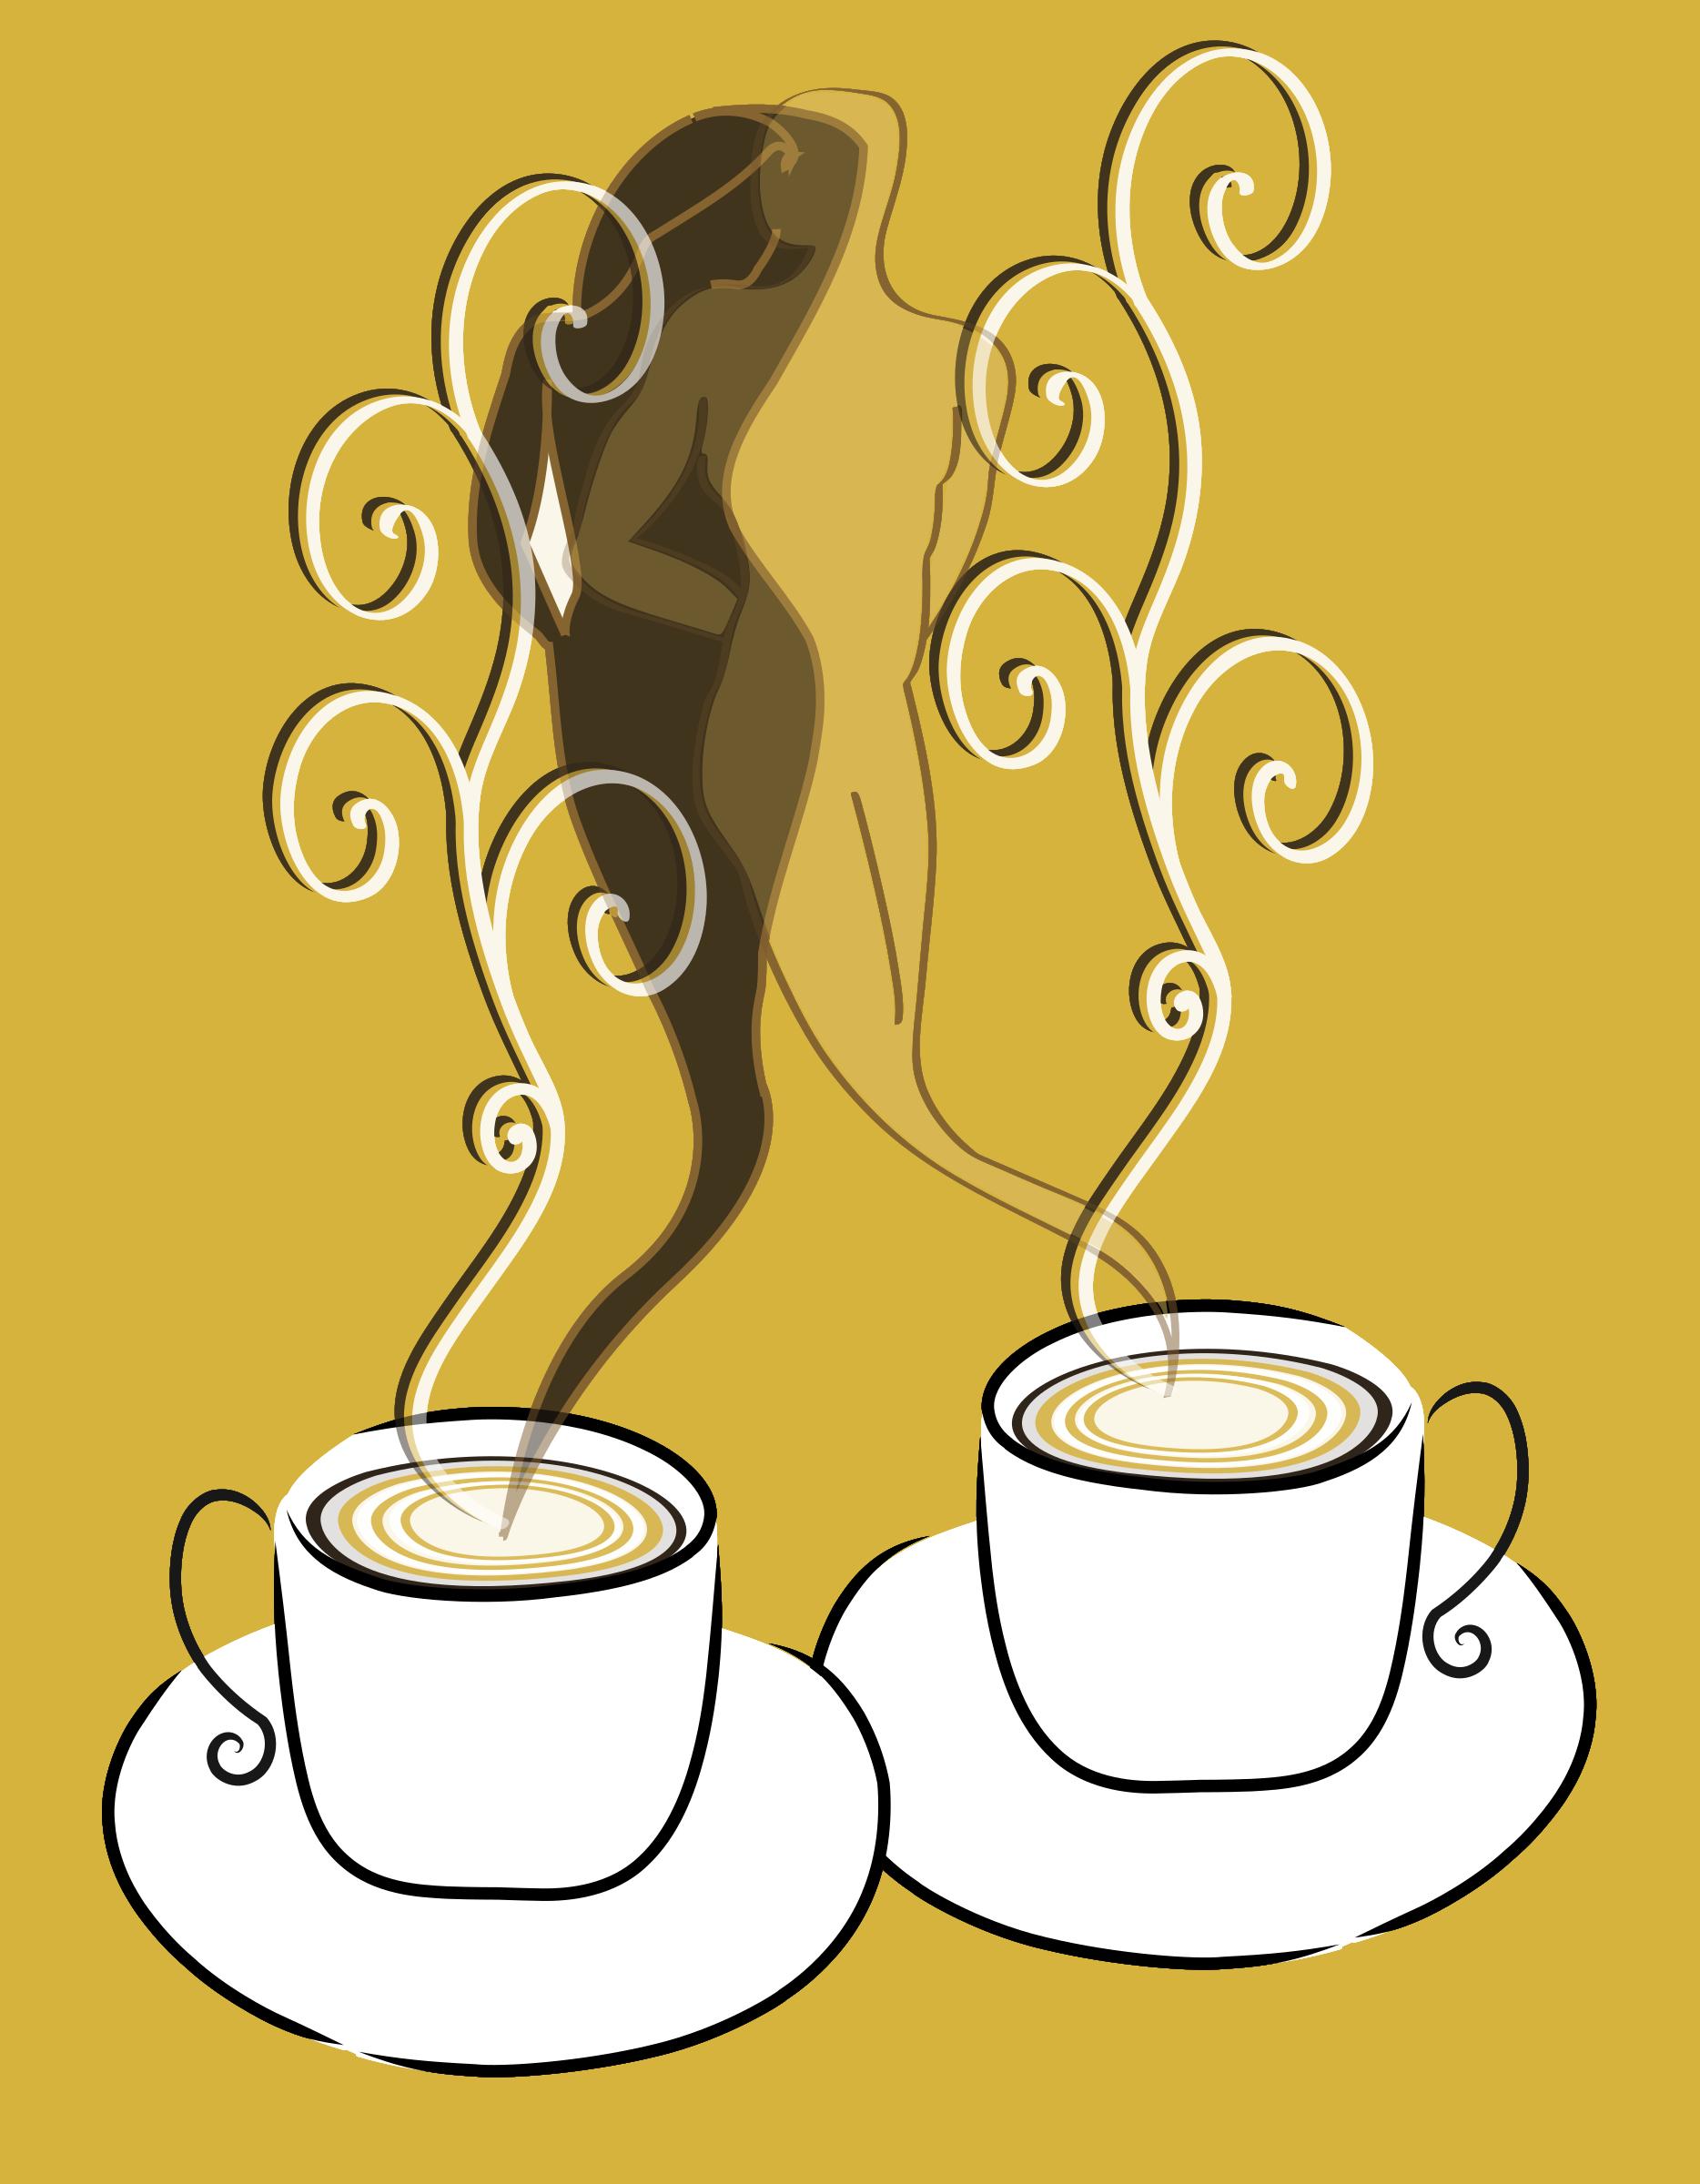 Coffee clipart coffee love Coffee love love coffee Clipart